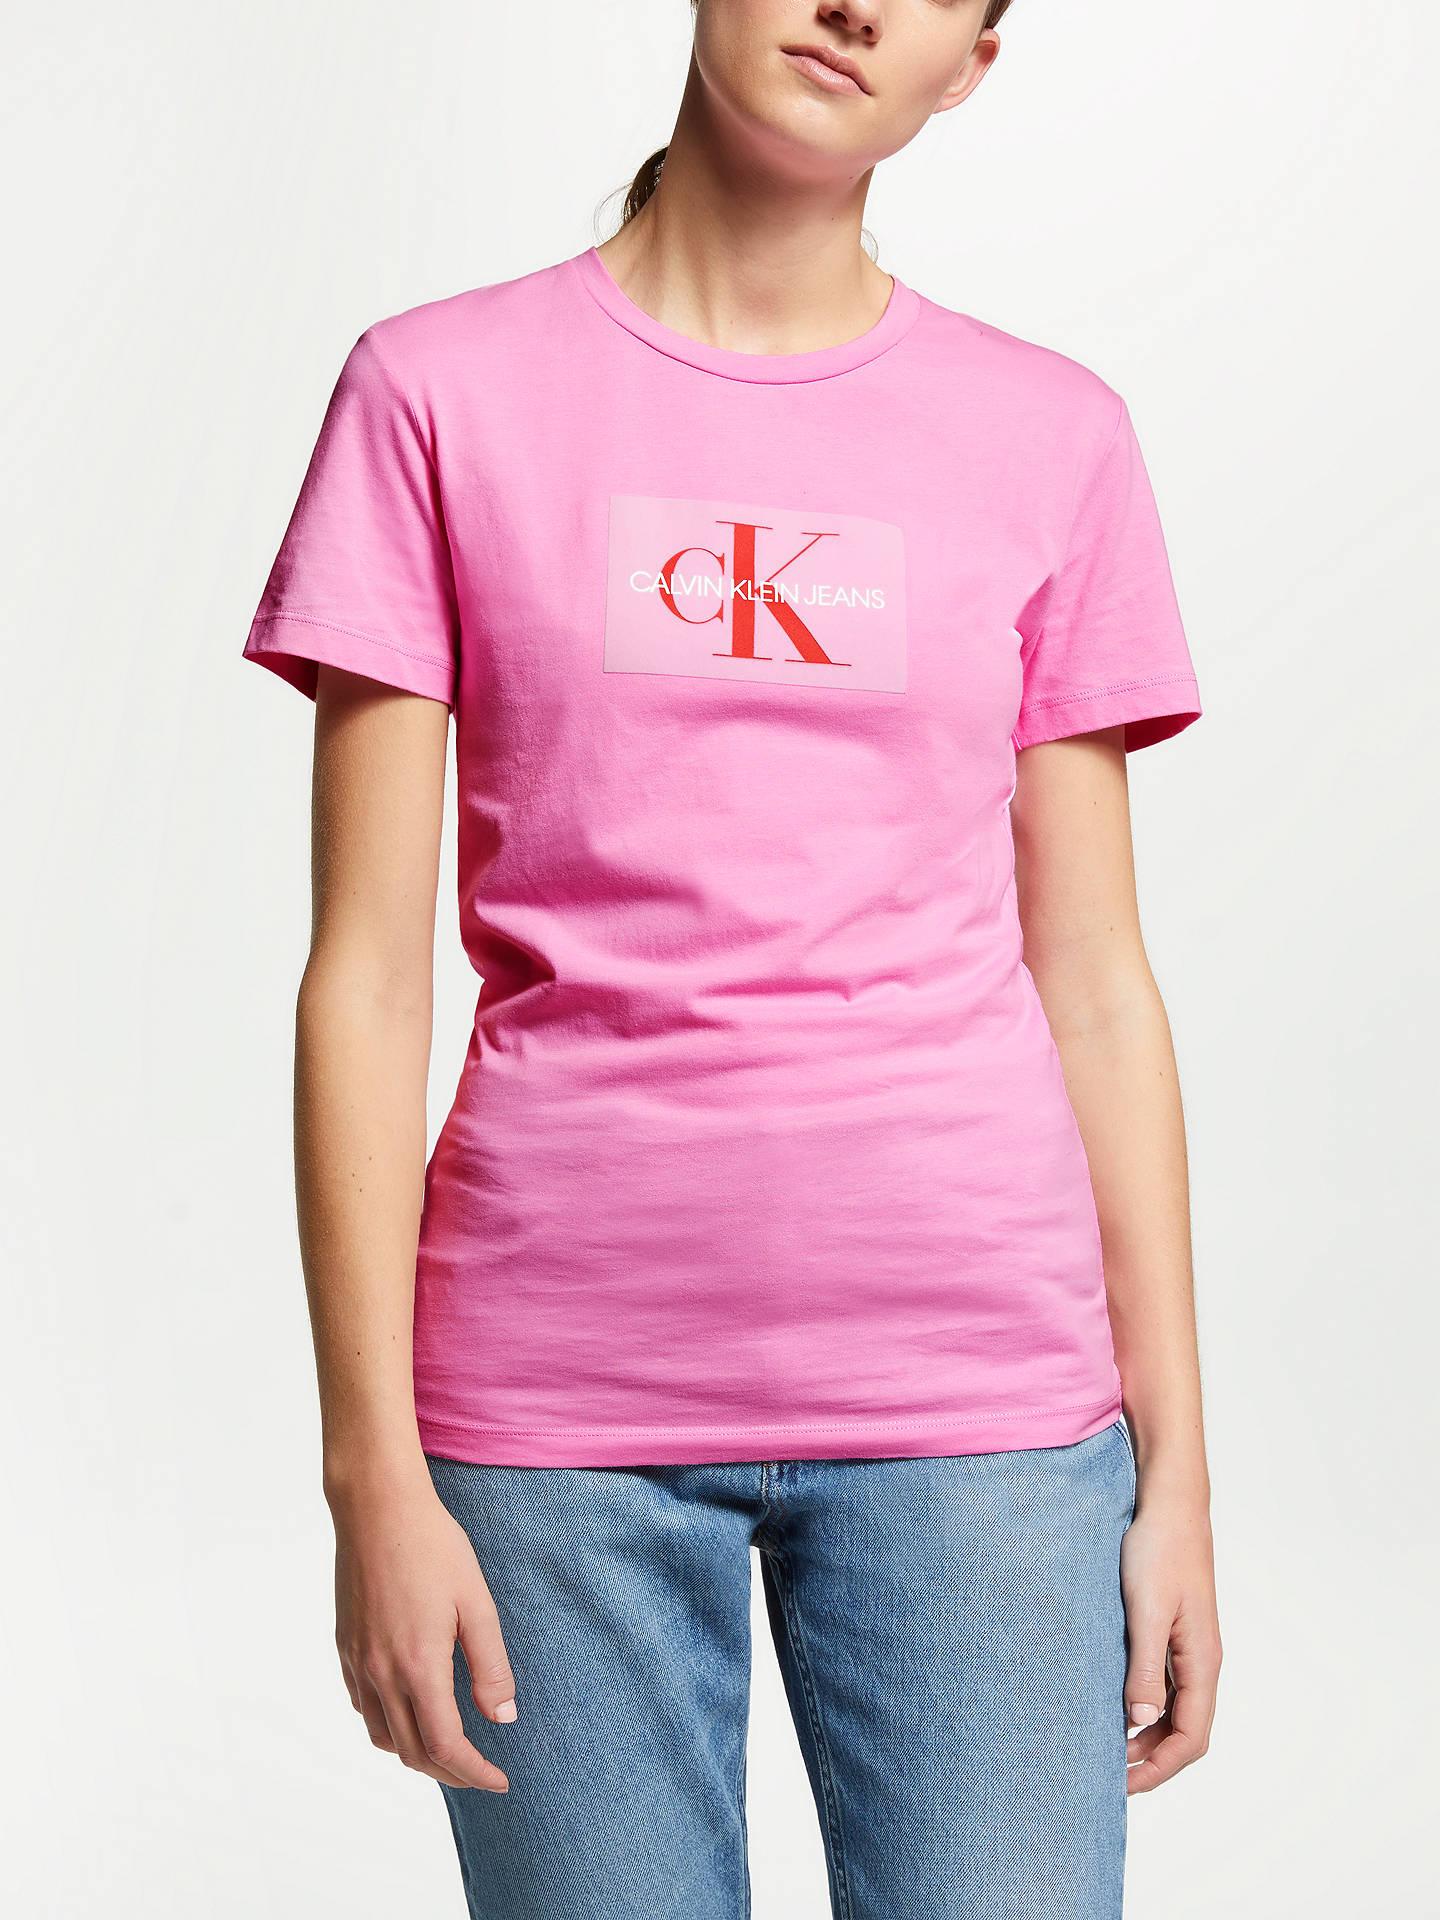 Calvin Klein Jeans Girls T Shirt Pink